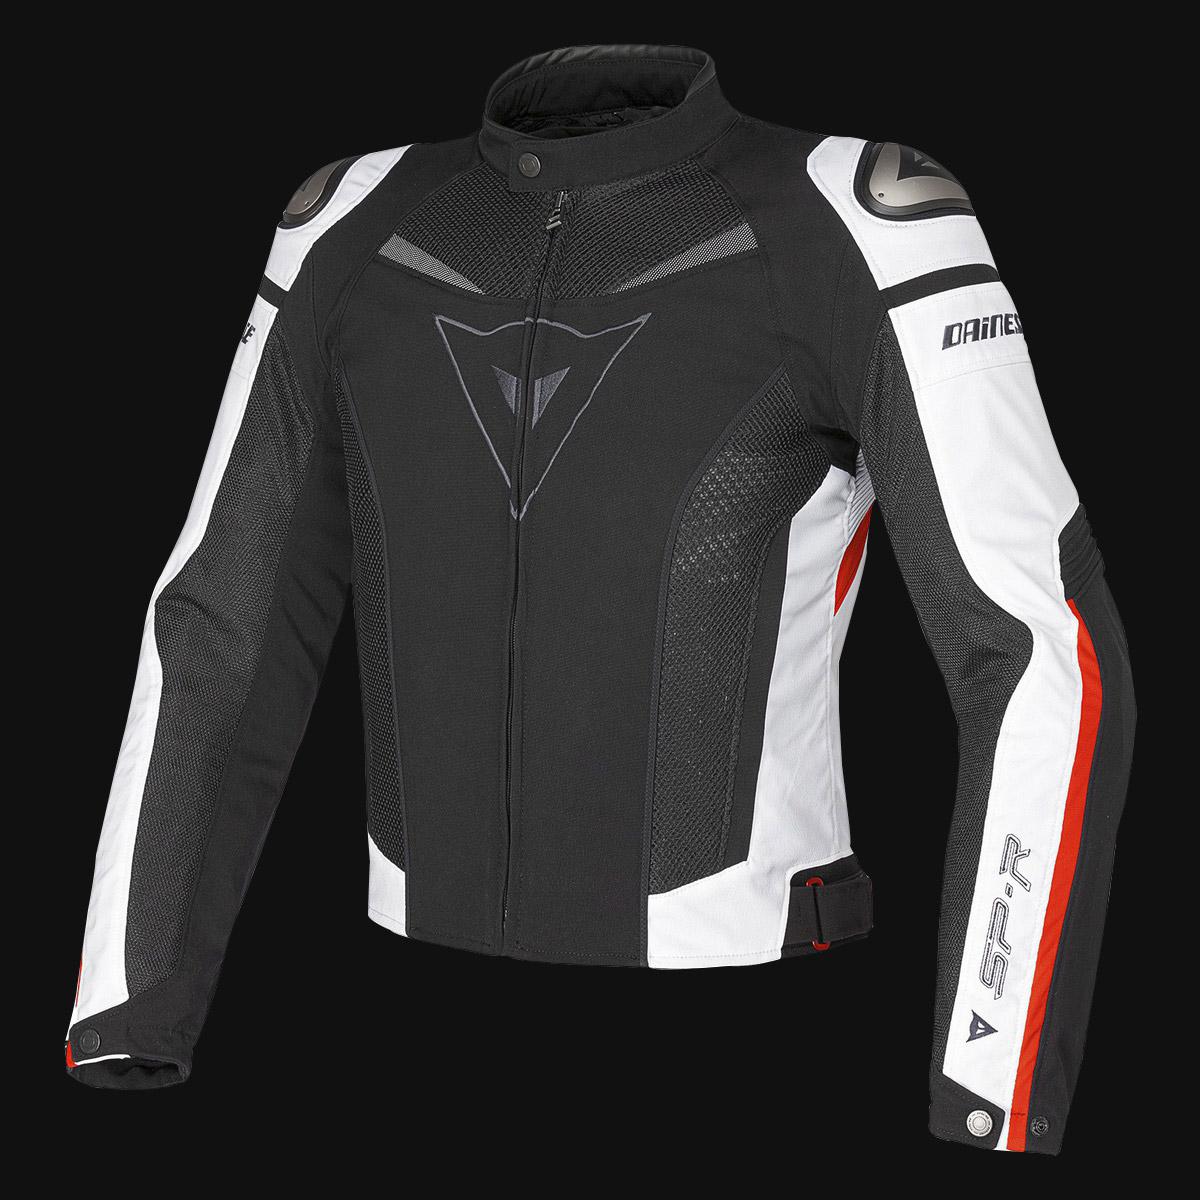 Dainese-รุ่น-Super-Speed-Tex-Jacket-1